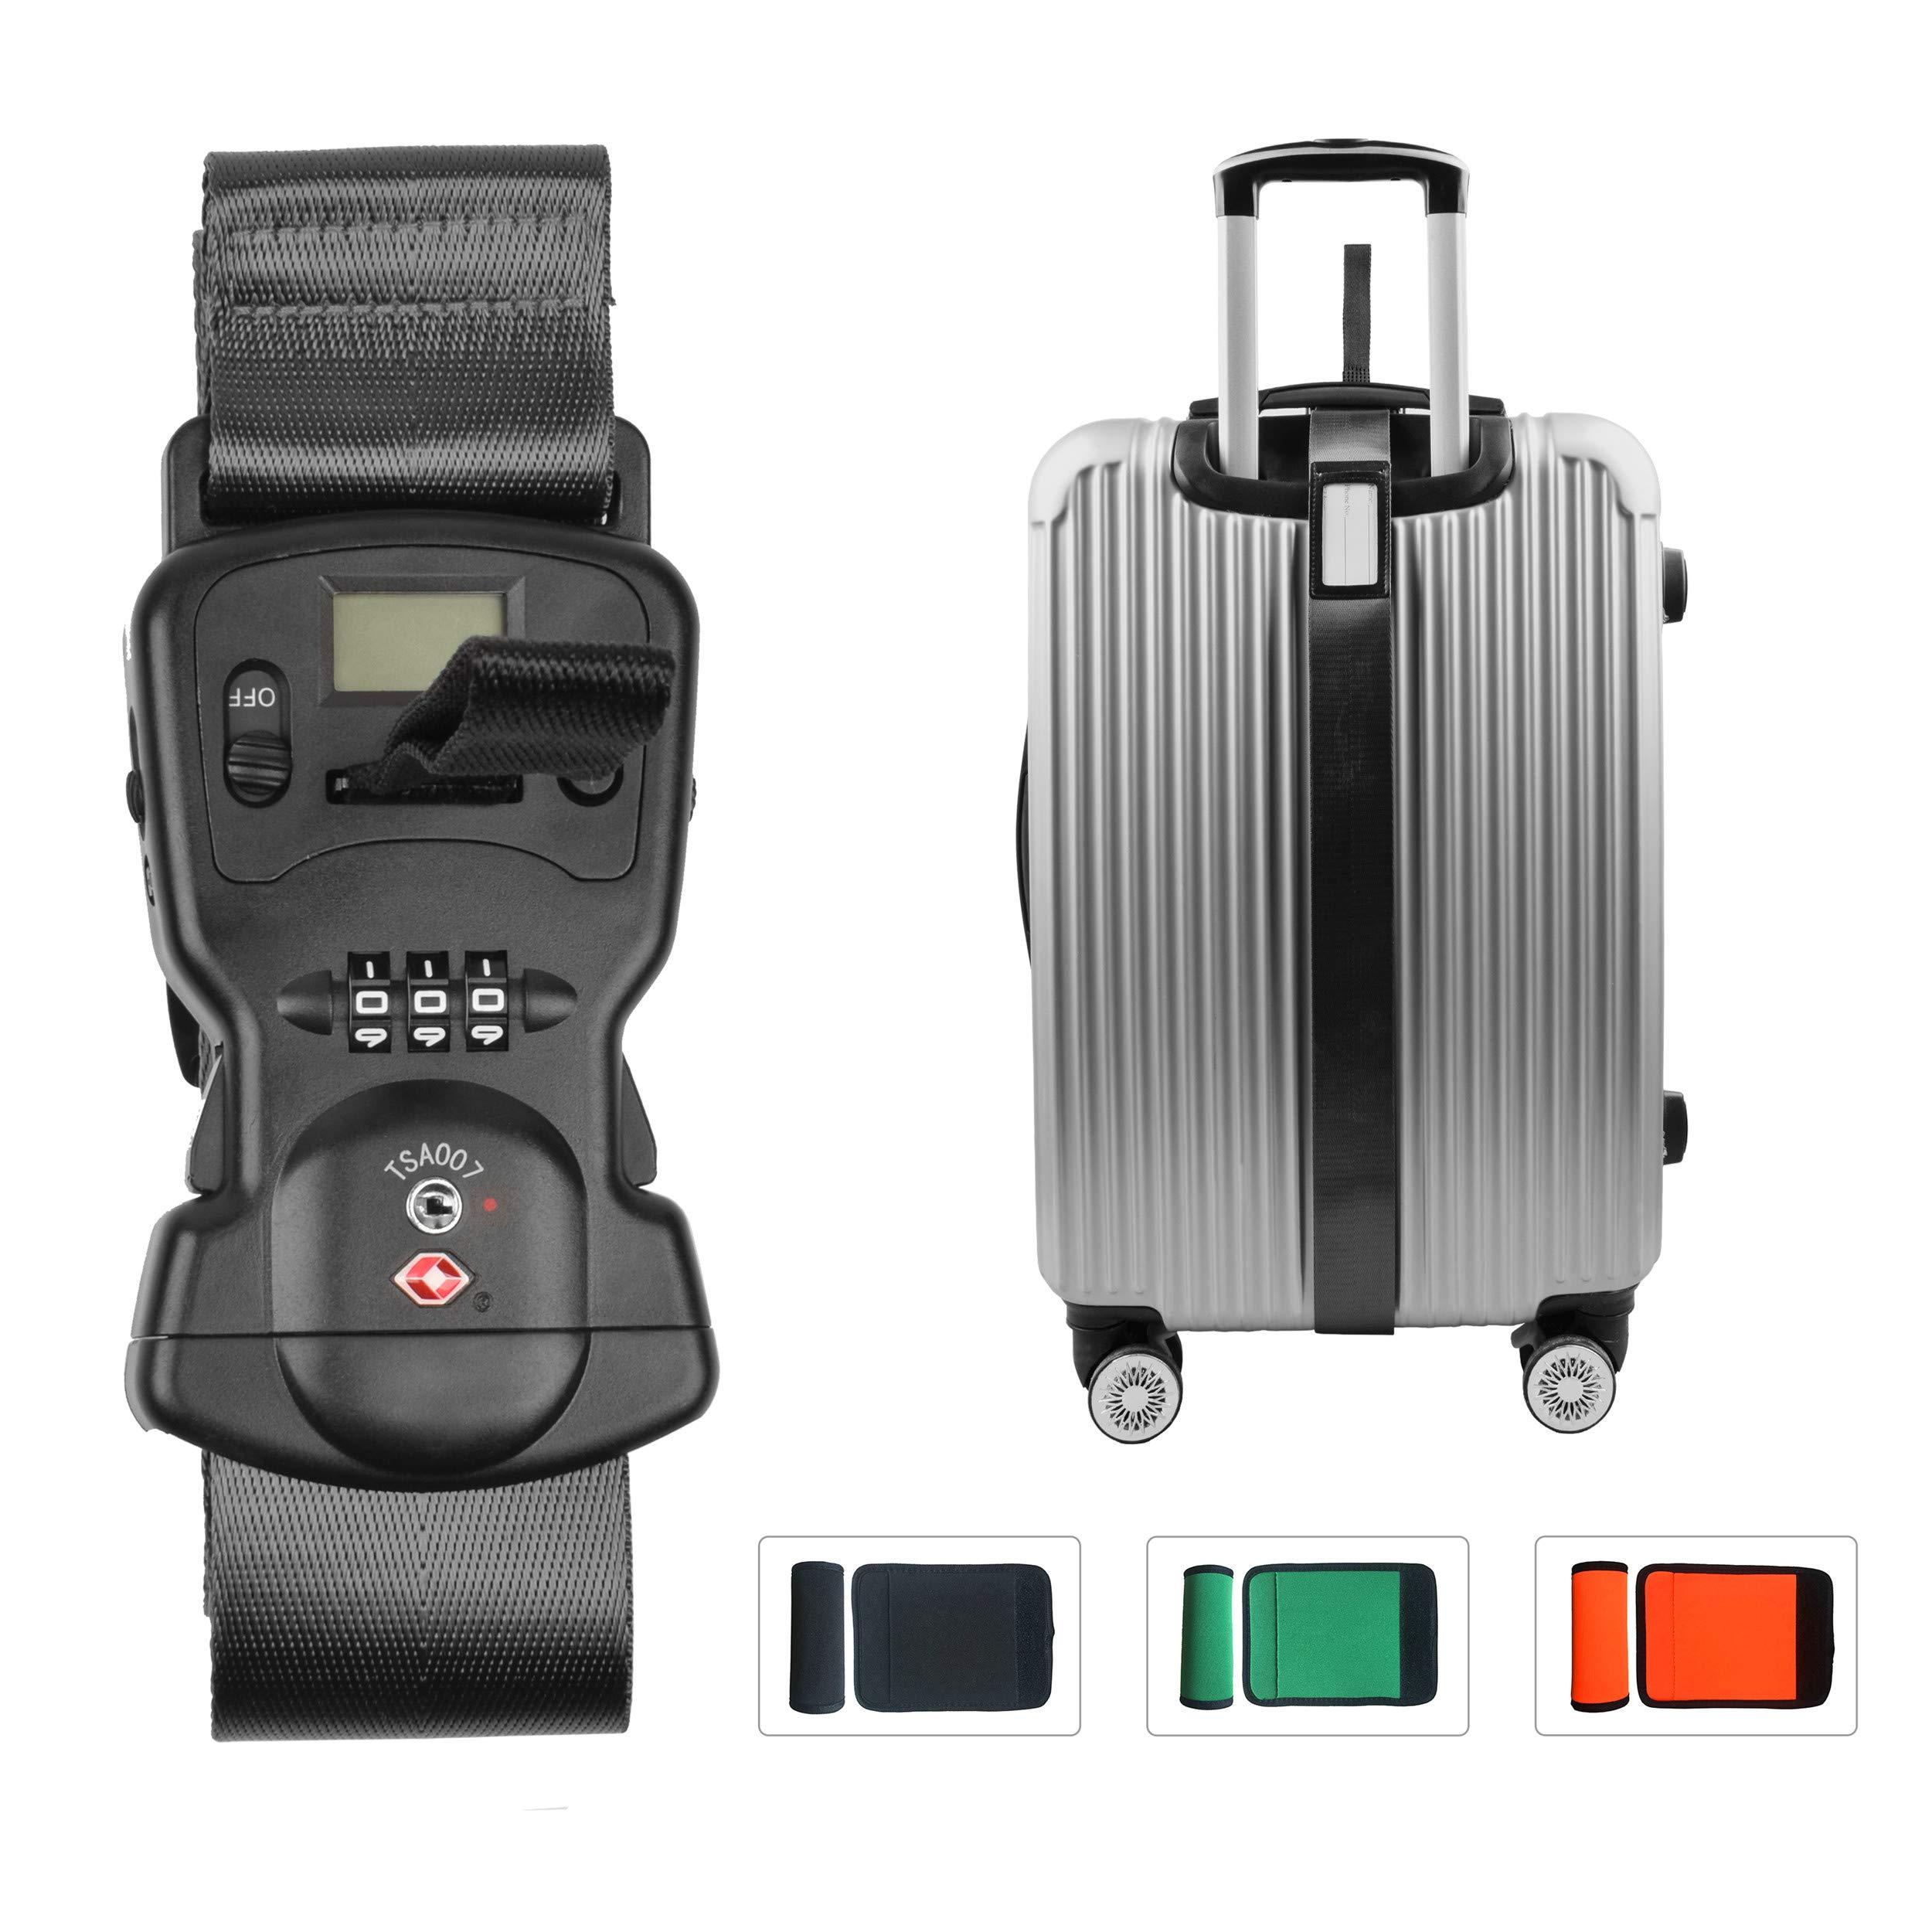 Smaior Luggage Scale Luggage Straps Tsa Luggage Locks 3 in 1 Travel Accessories (Black)